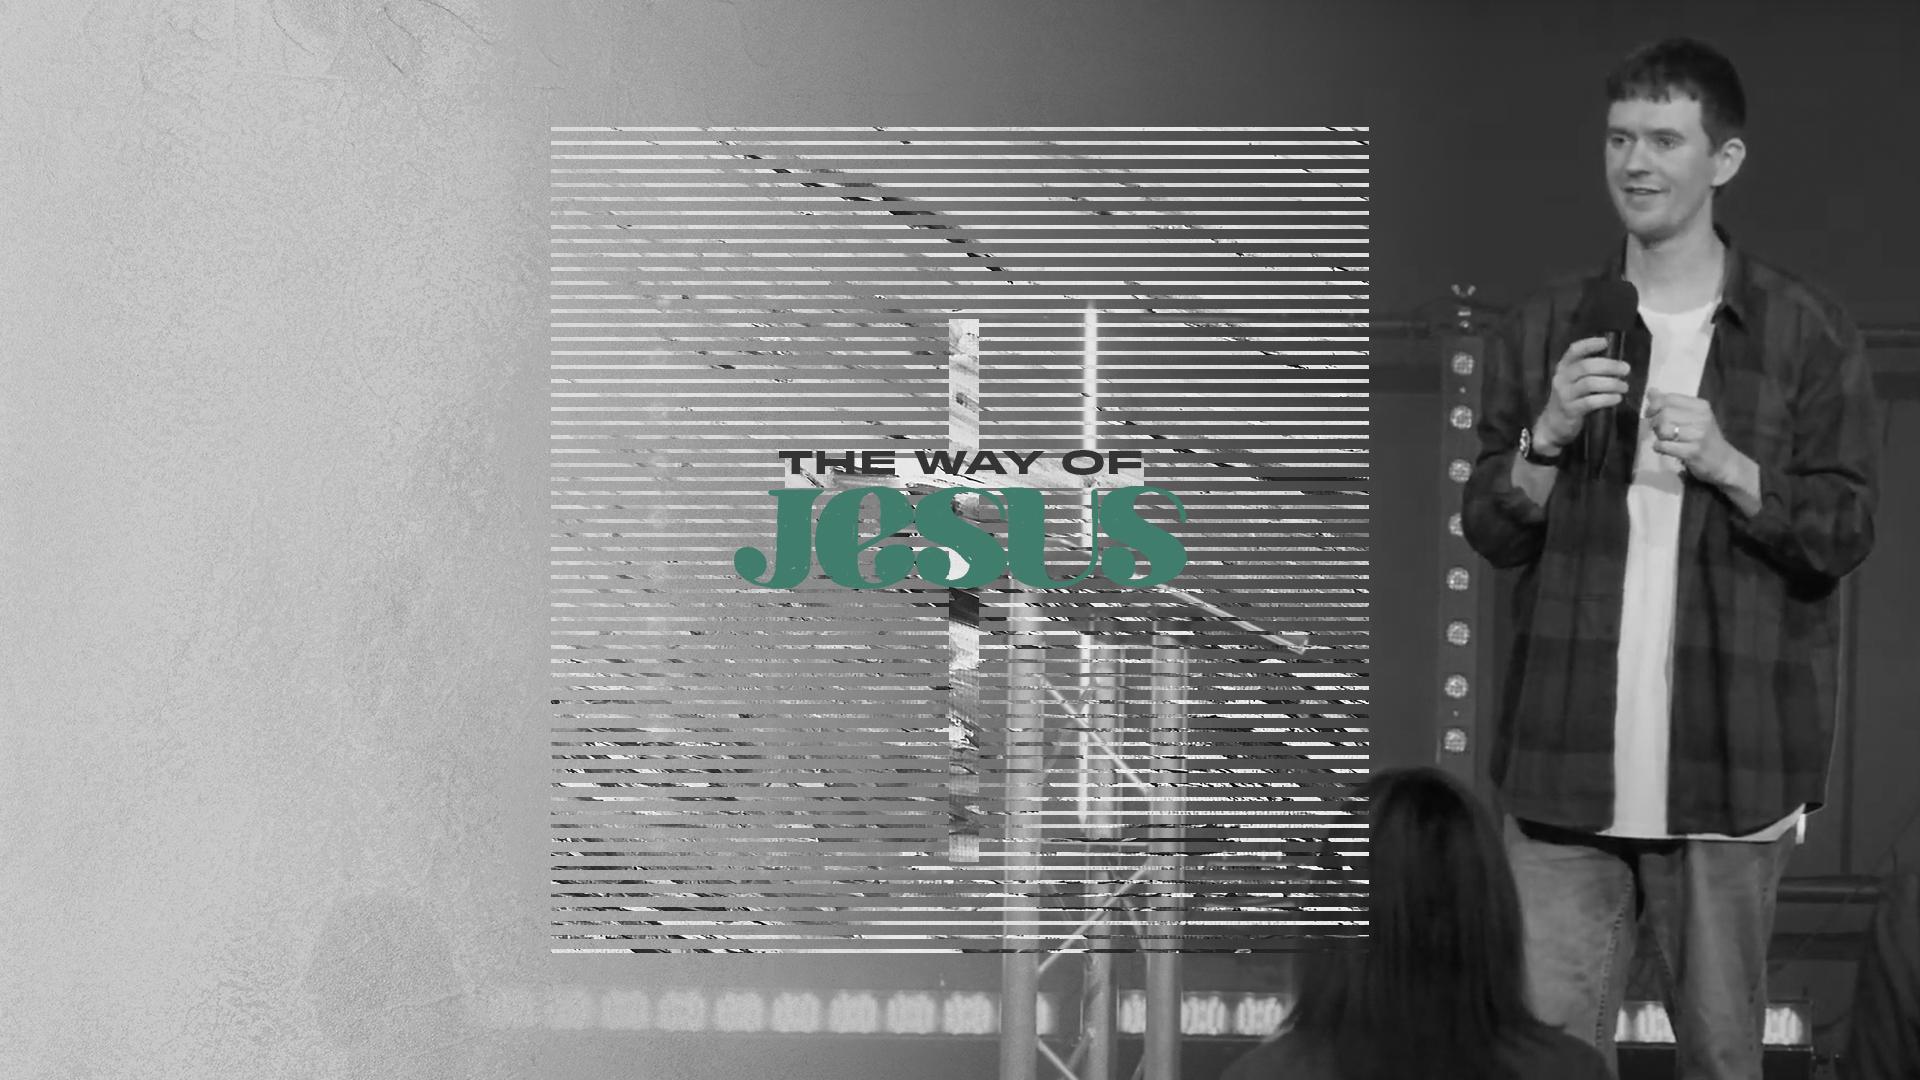 The Way of Jesus - Week 7 - Ben Lewis